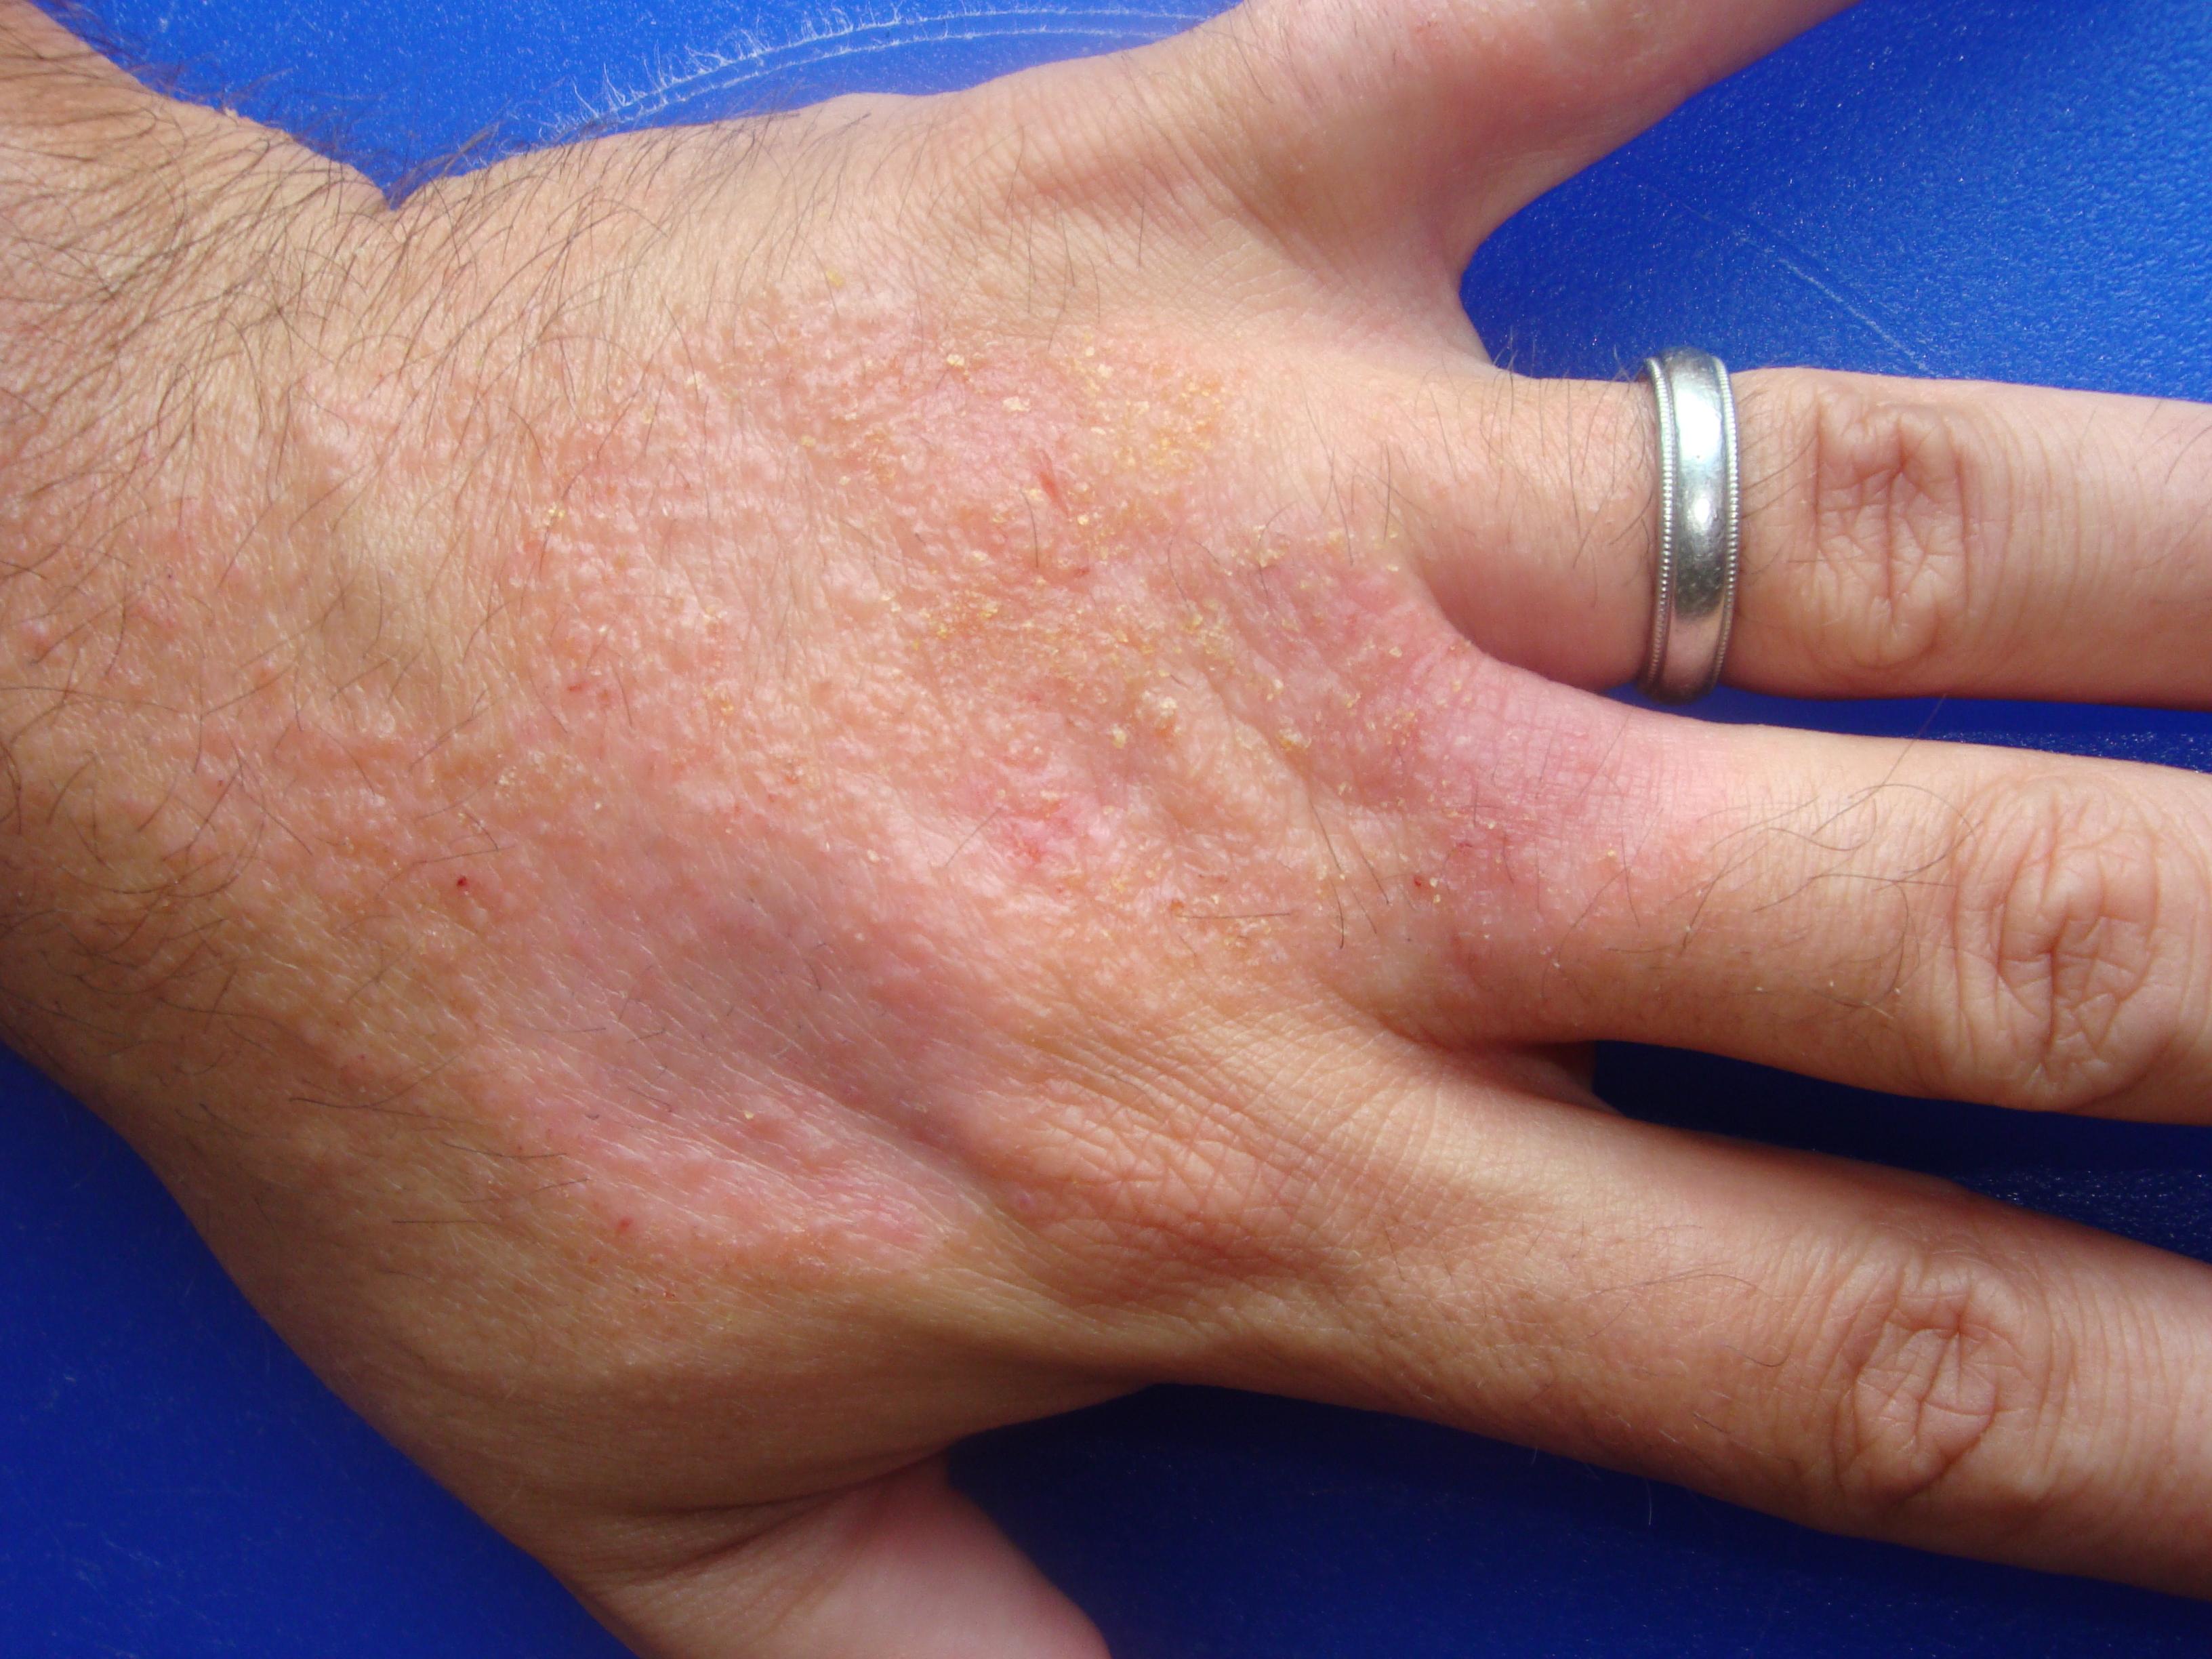 Occupational Contact Dermatitis (dermatitis occupational